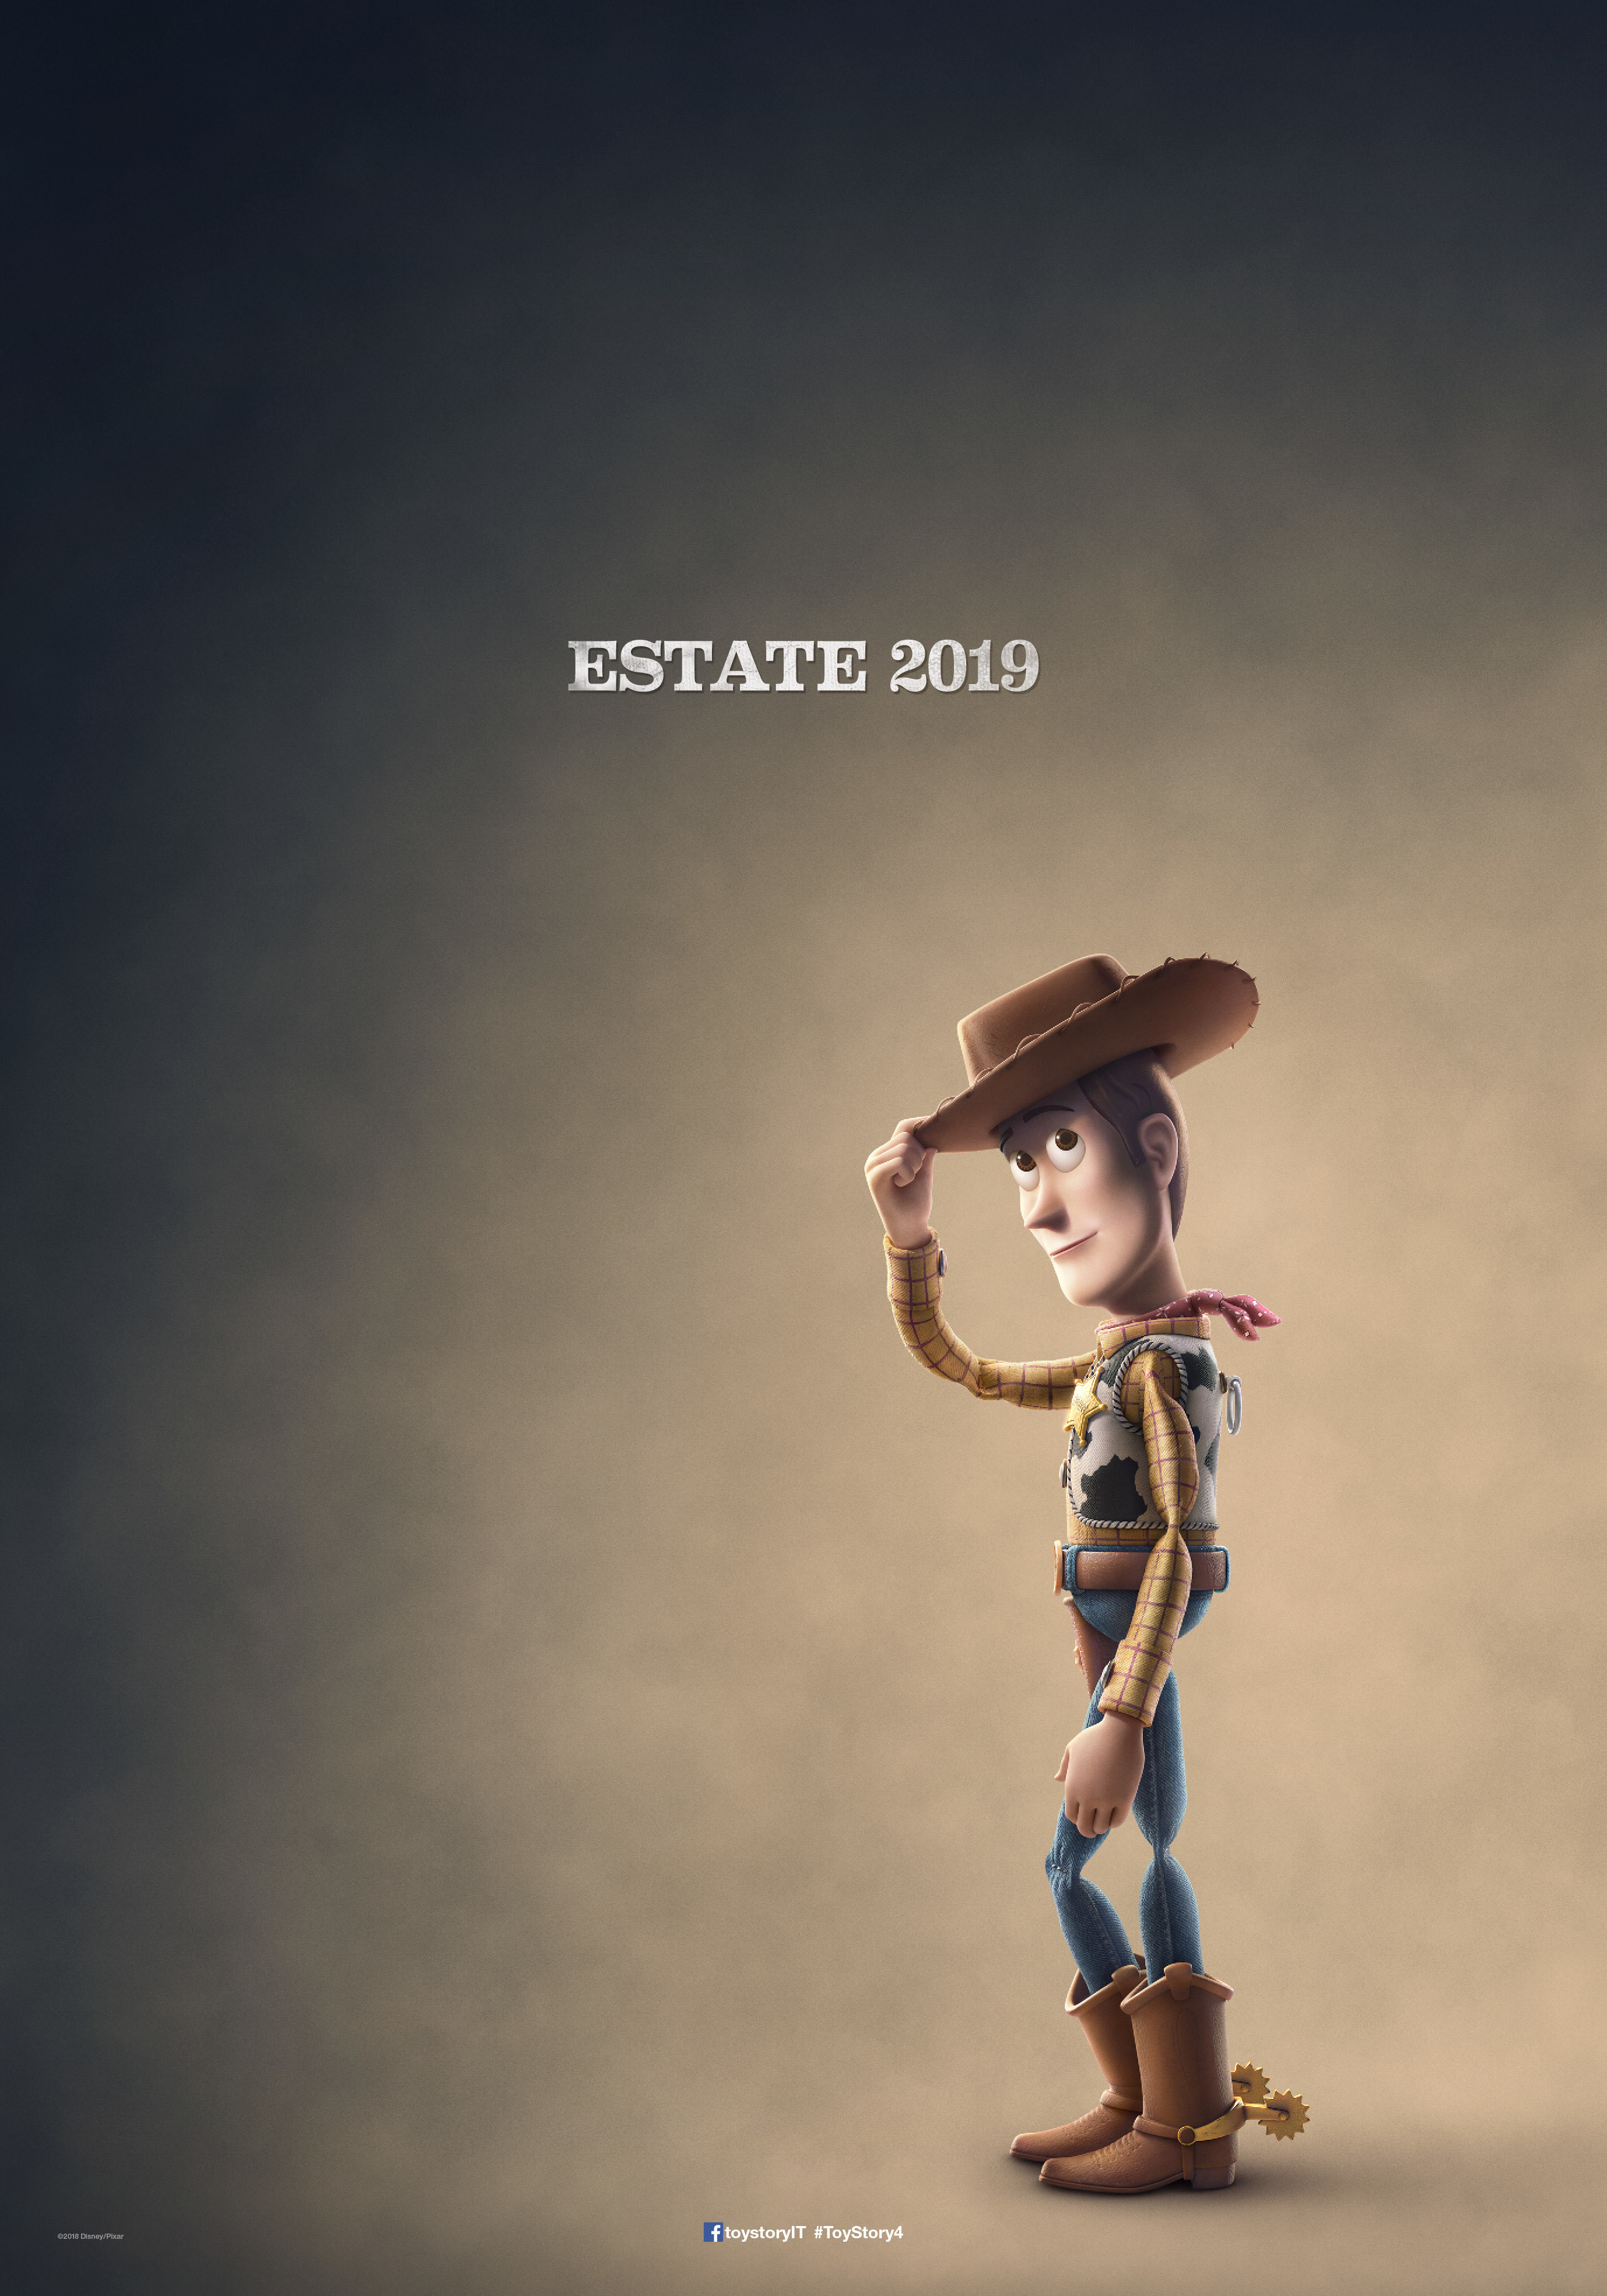 Poster Toy Story 4 italiano.jpg